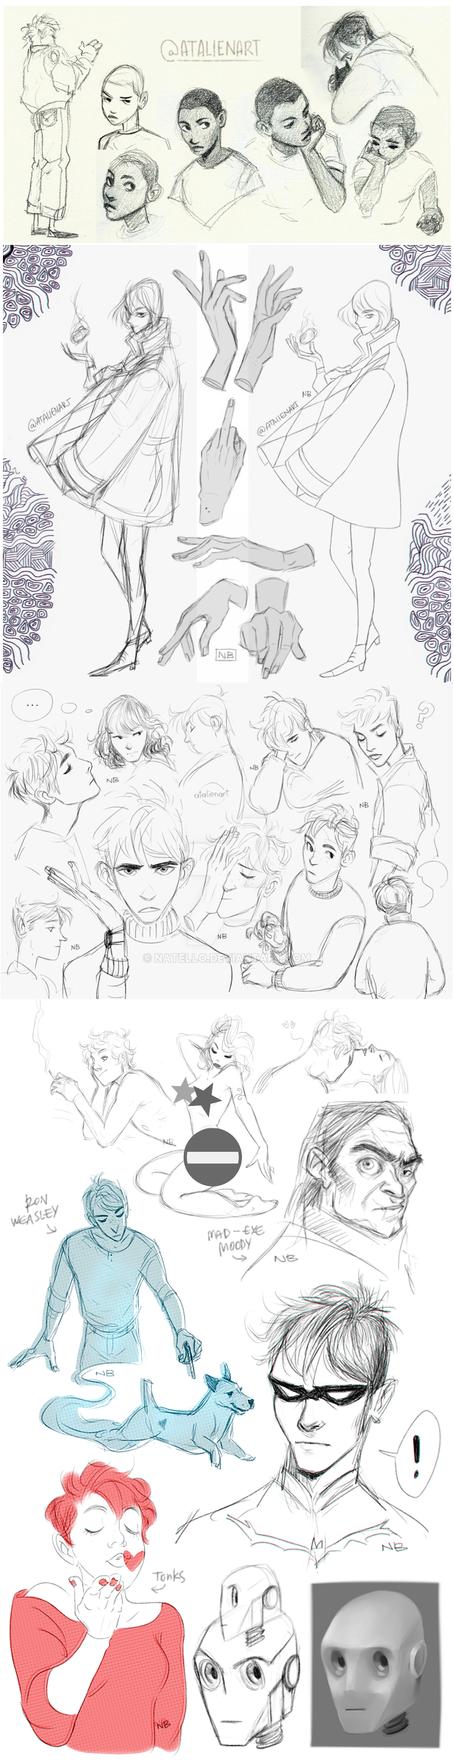 Sketch dump by Natello